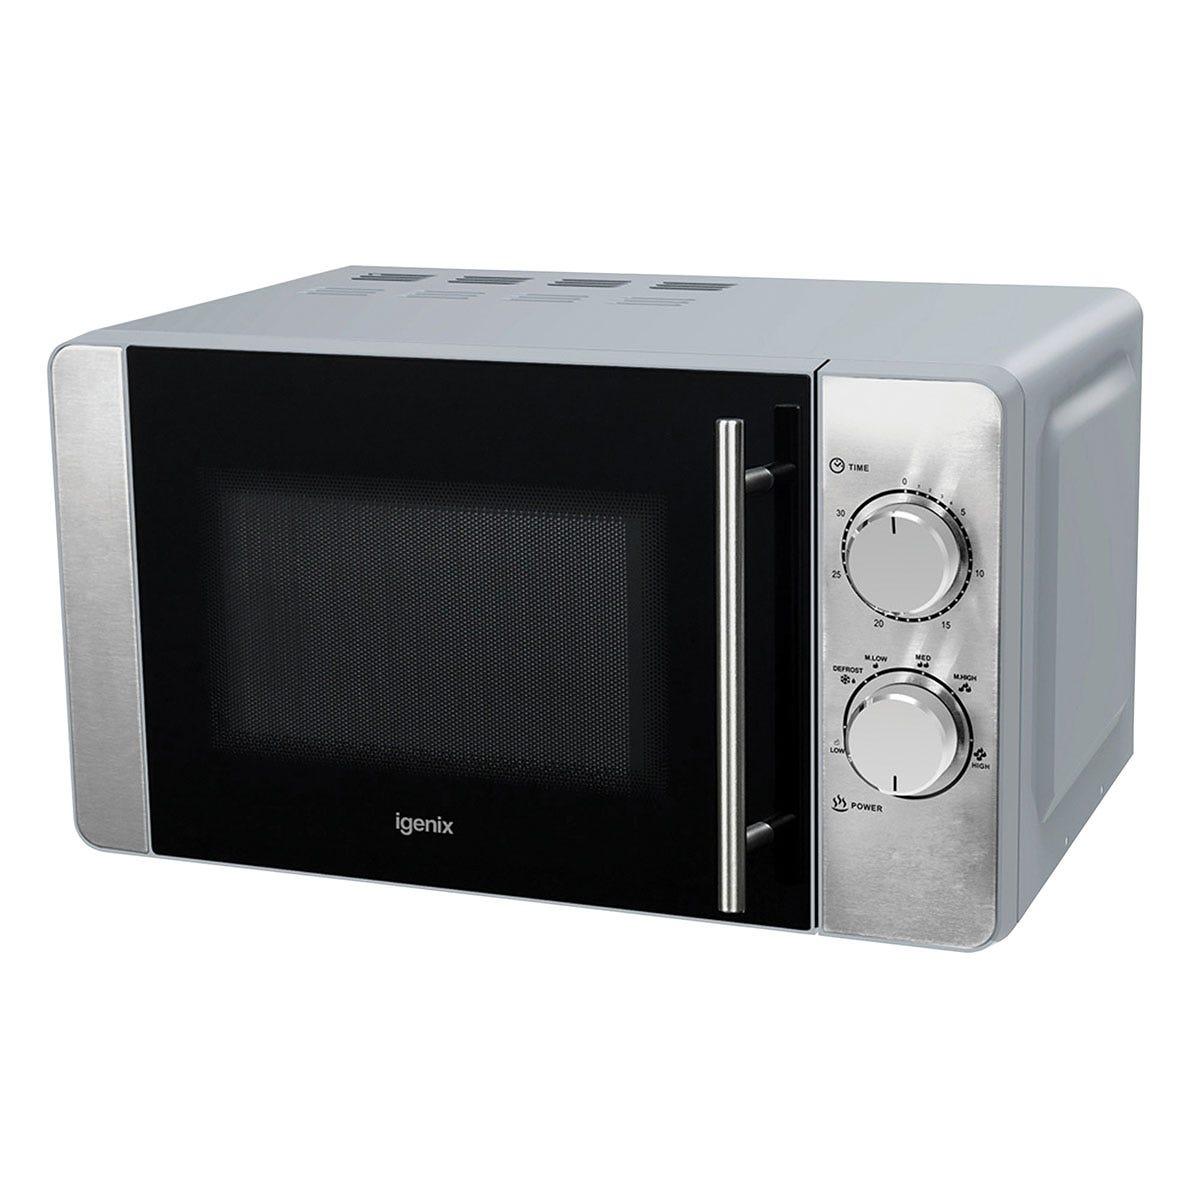 Igenix IG2084 800W Manual 20L Microwave - Silver